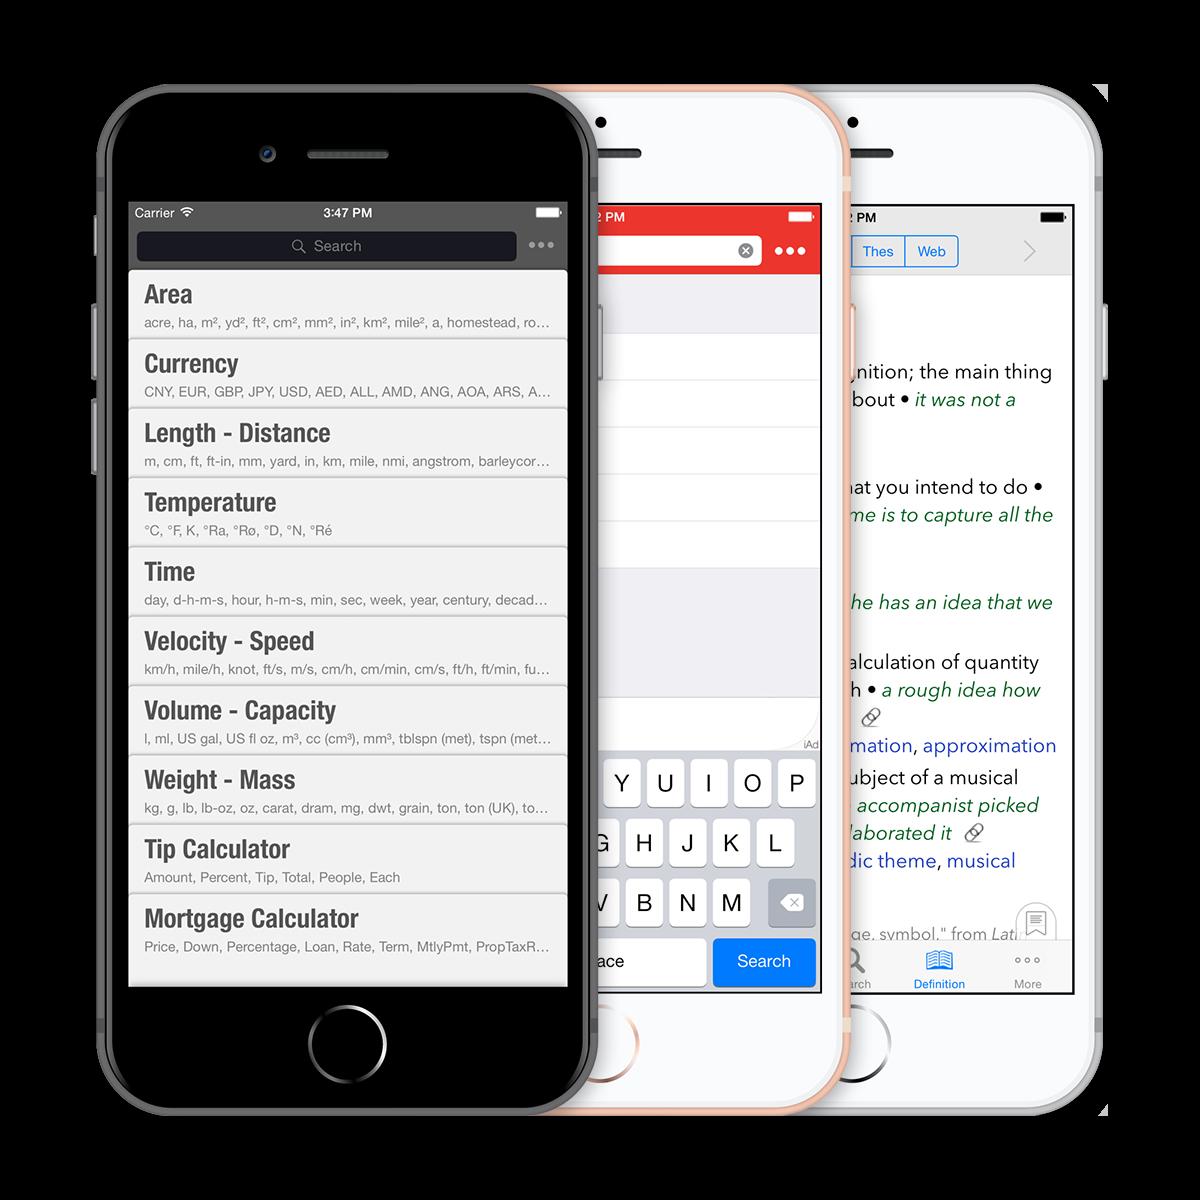 trancreative - a mobile app company